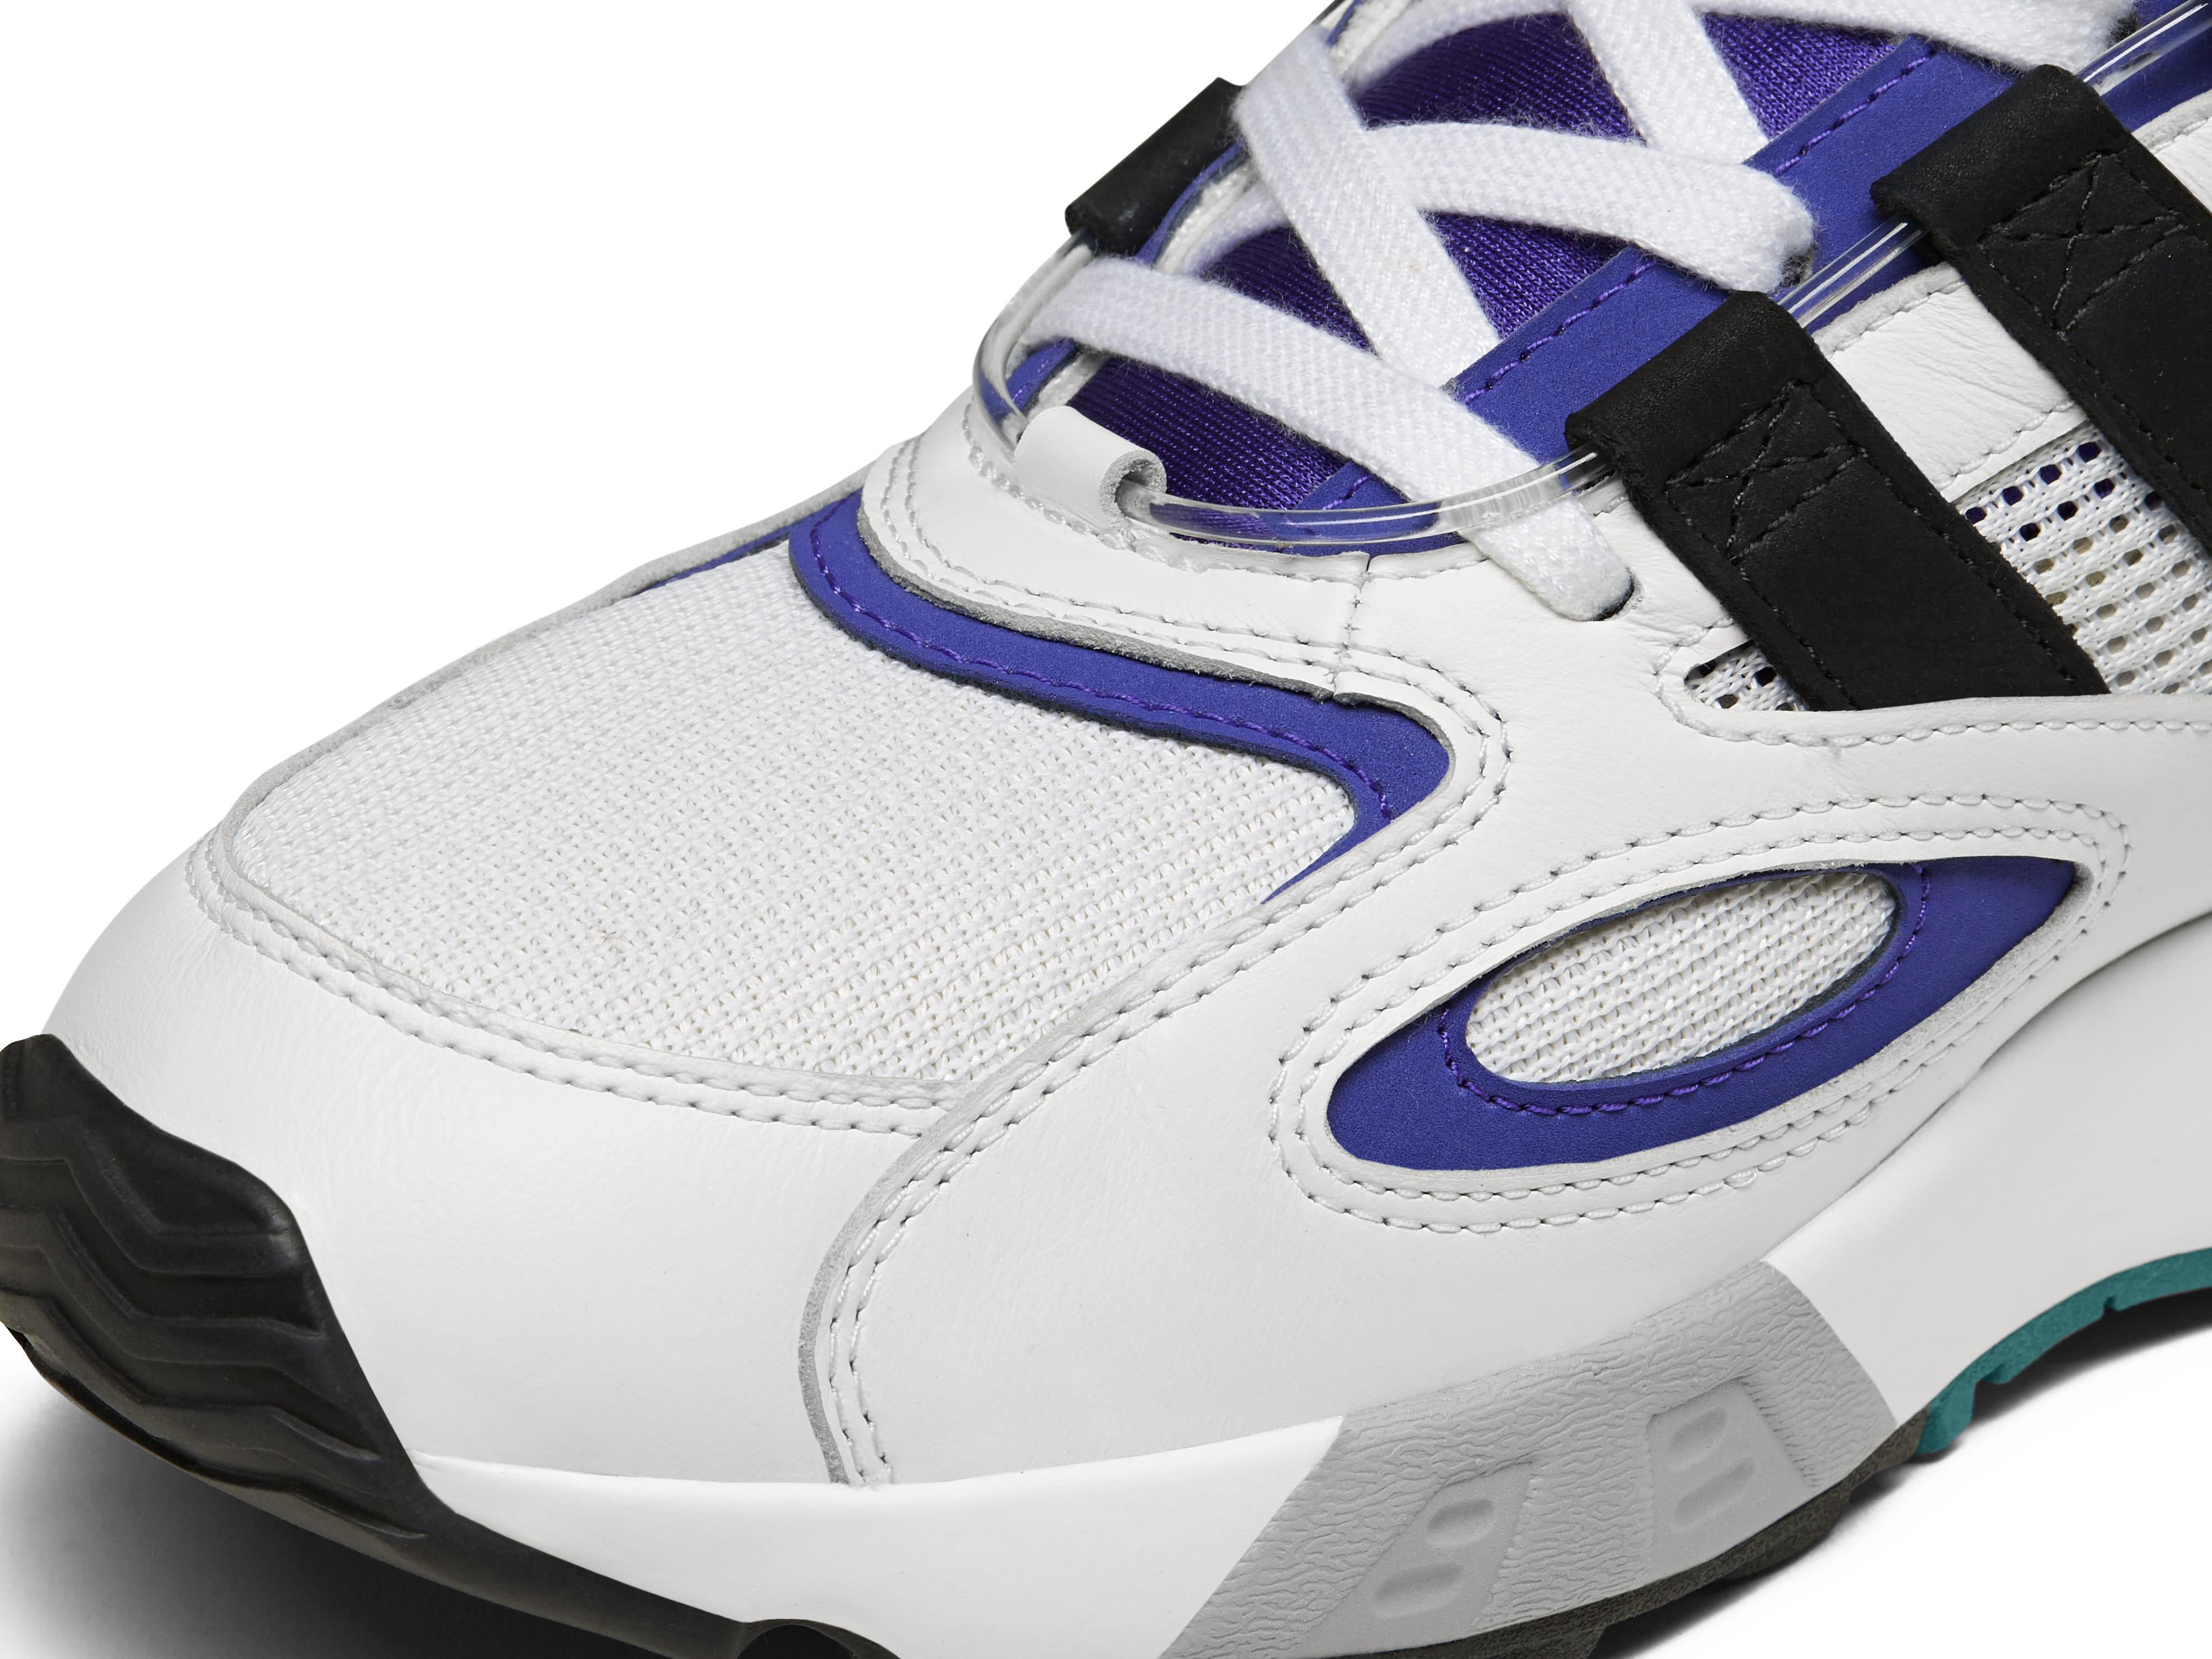 Adidas Consortium LX CON EE3755 (Toe)